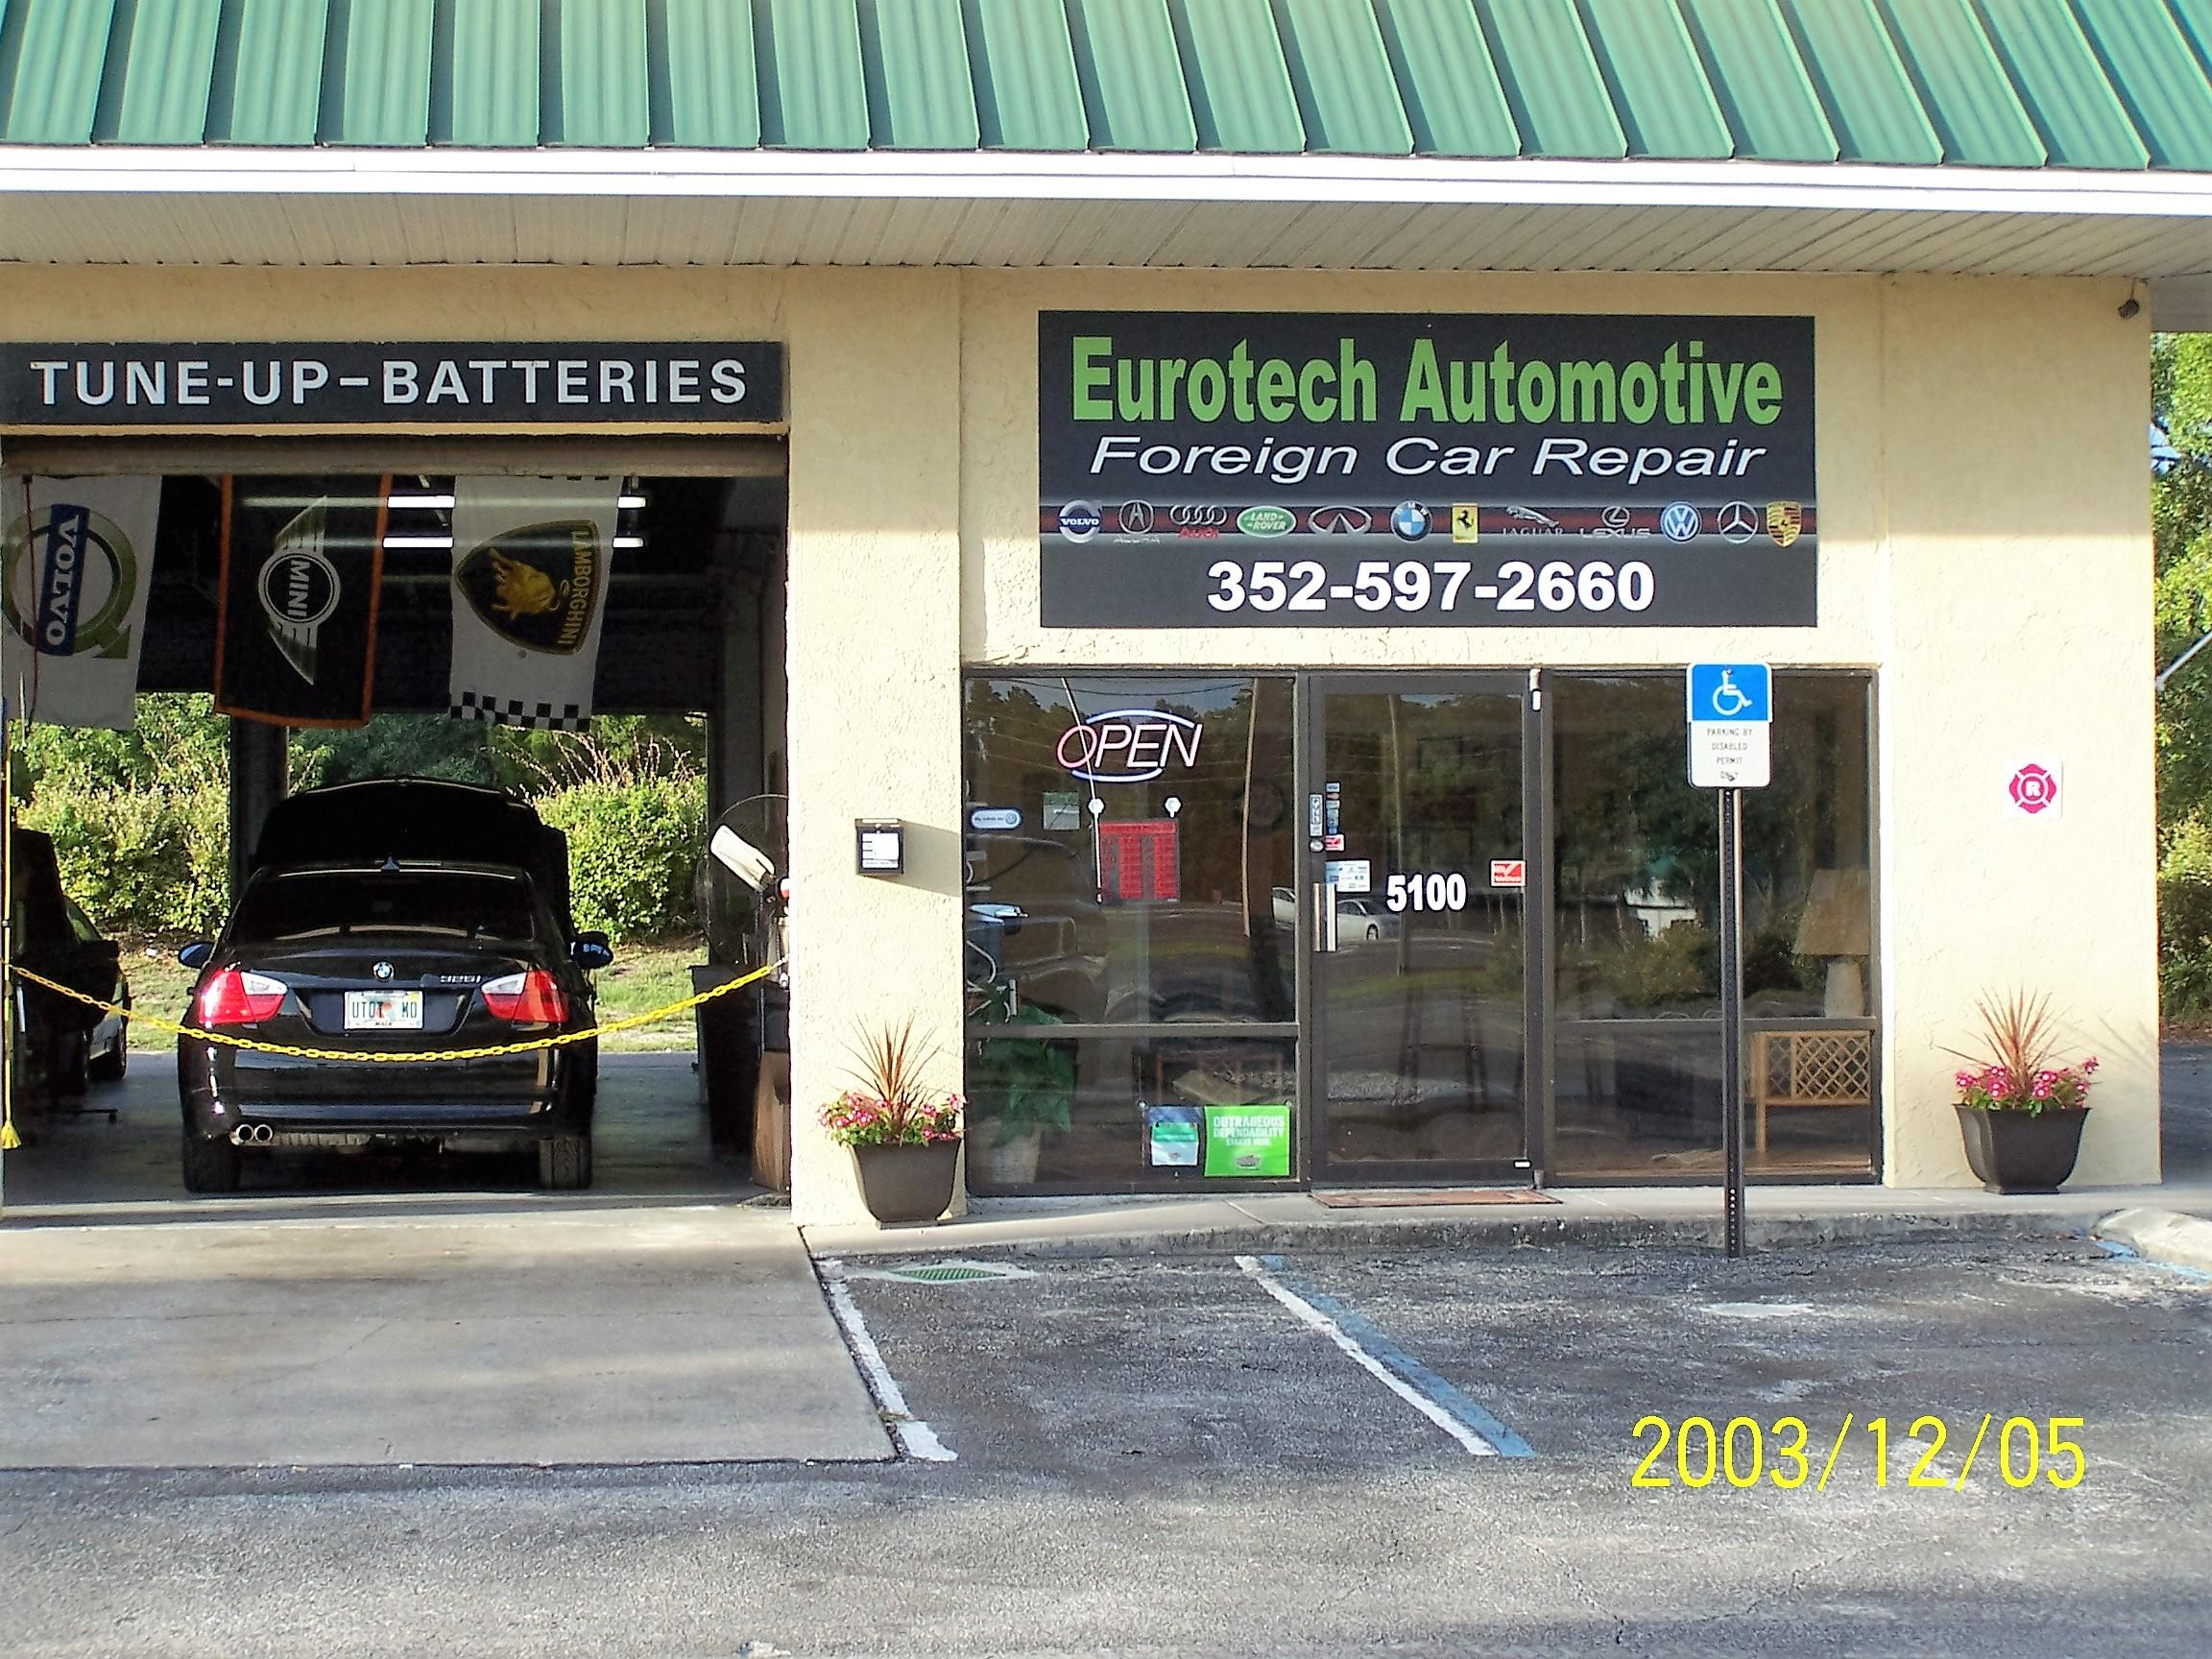 Eurotech Automotive image 1